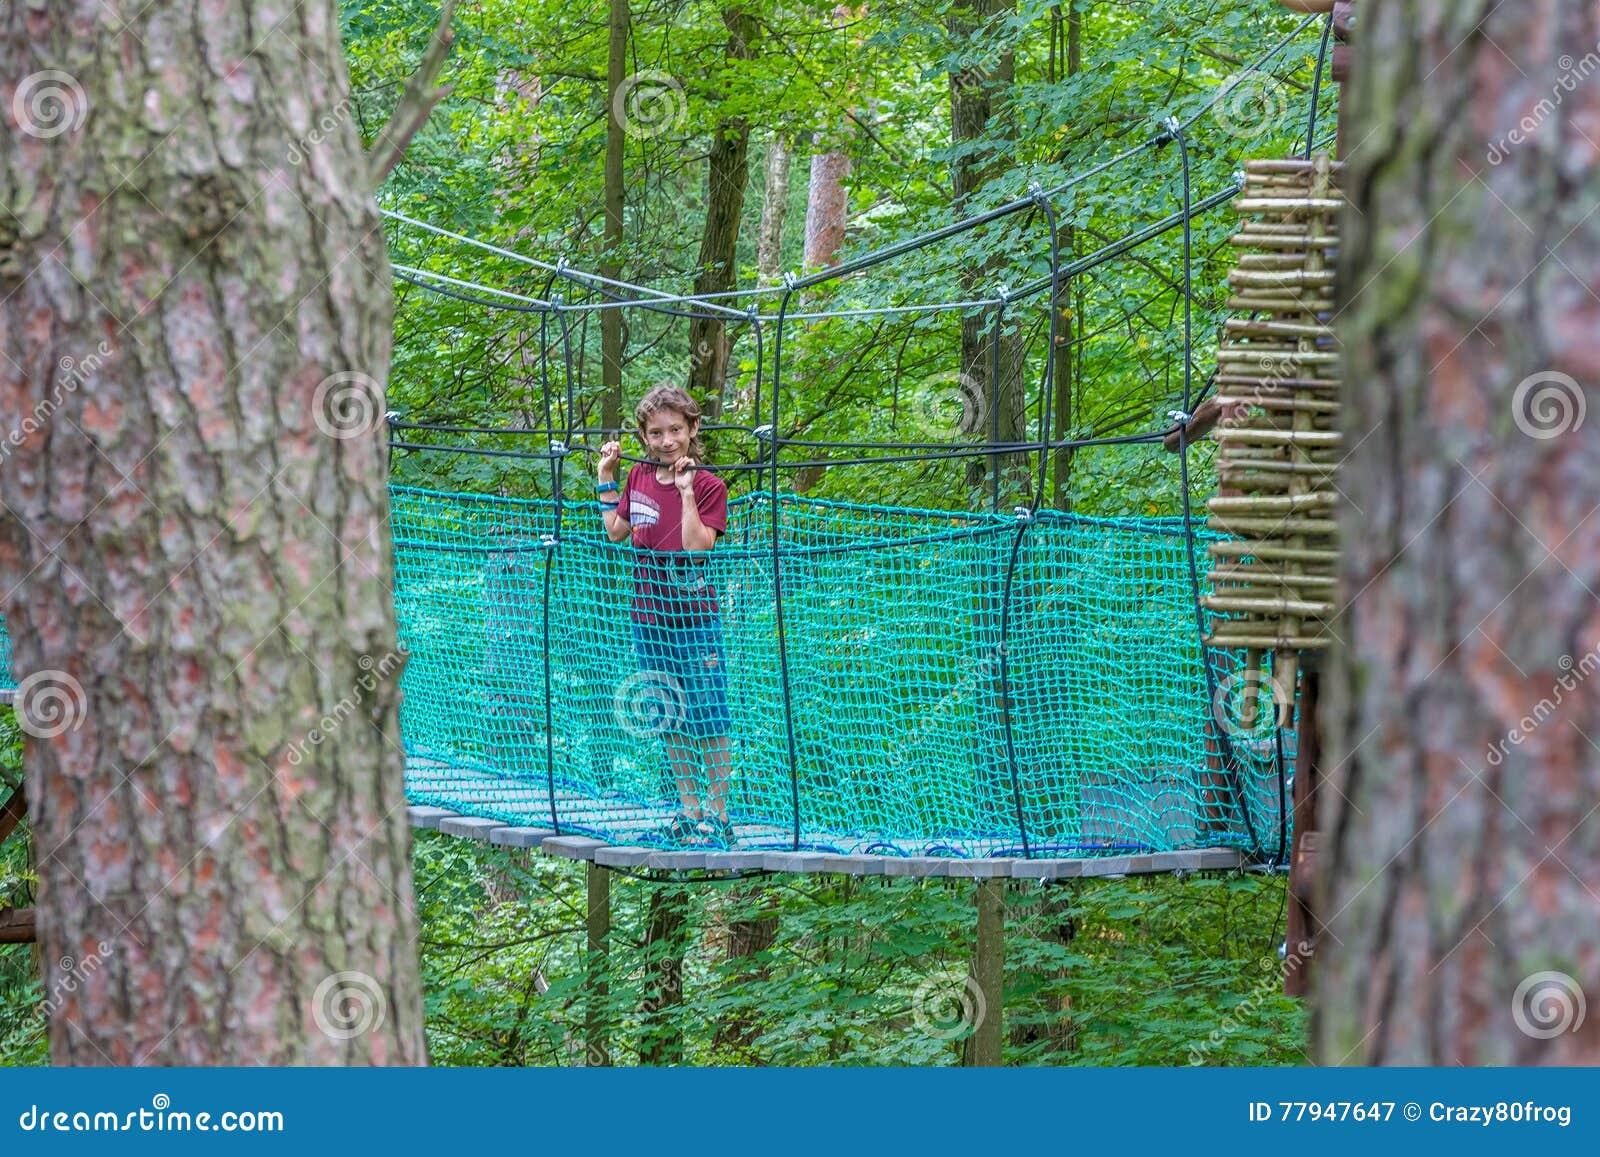 Young caucasian boy in adventure park